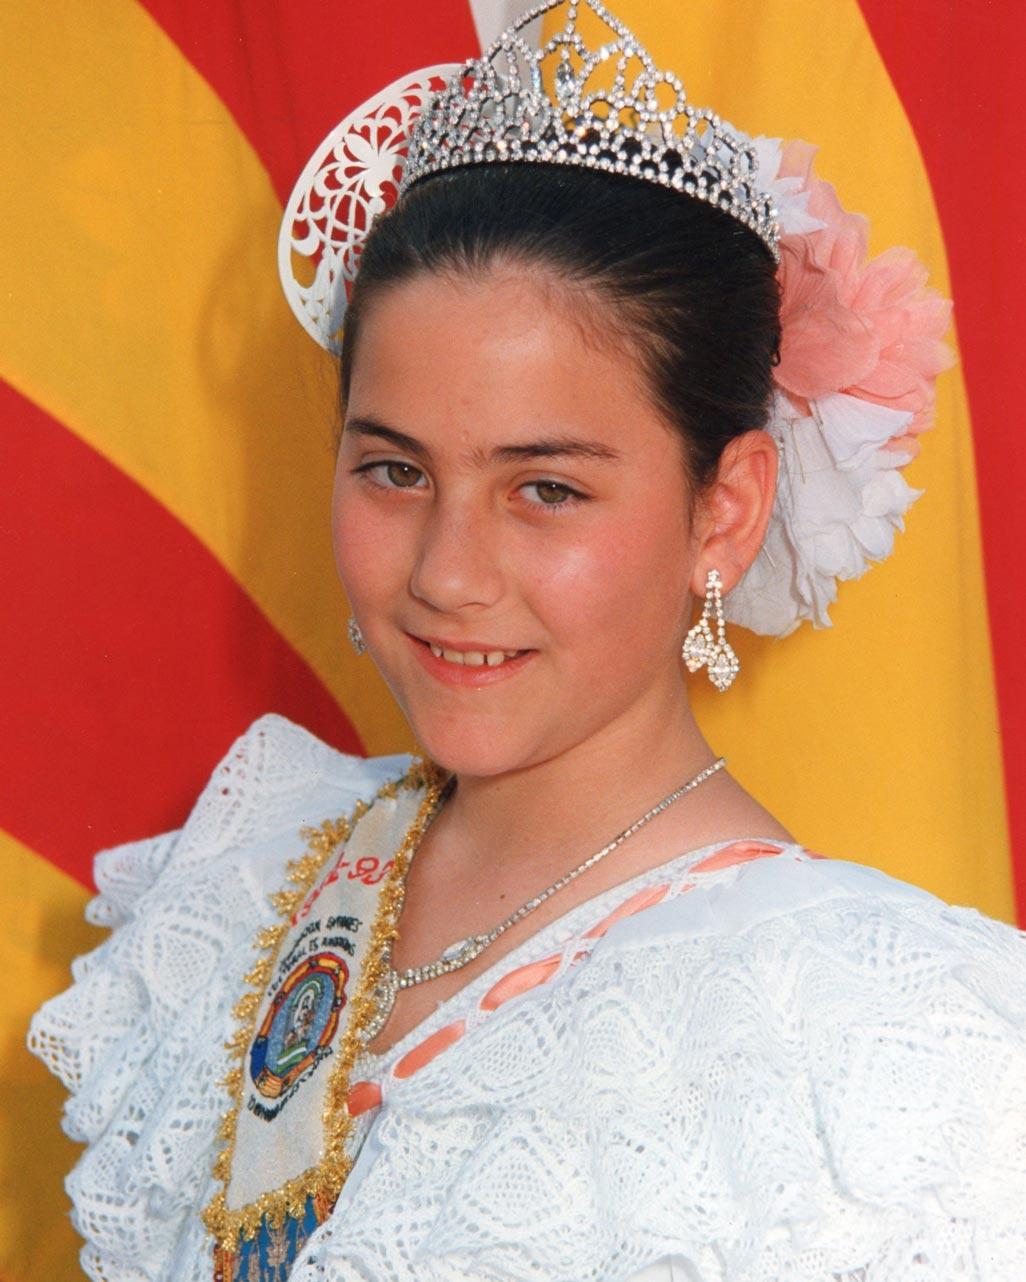 Nuria Morales Nieto 1991-1992 Centro Cultural Andaluz de Quart de Poblet